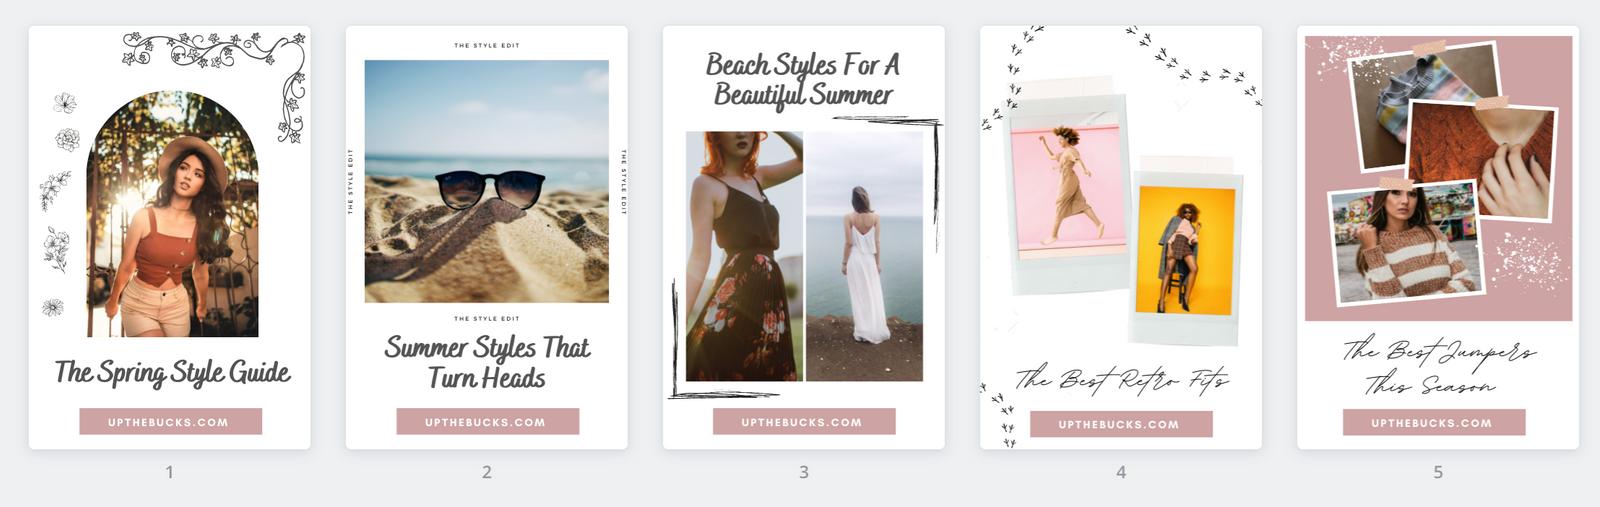 Pinterest Templates for Fashion